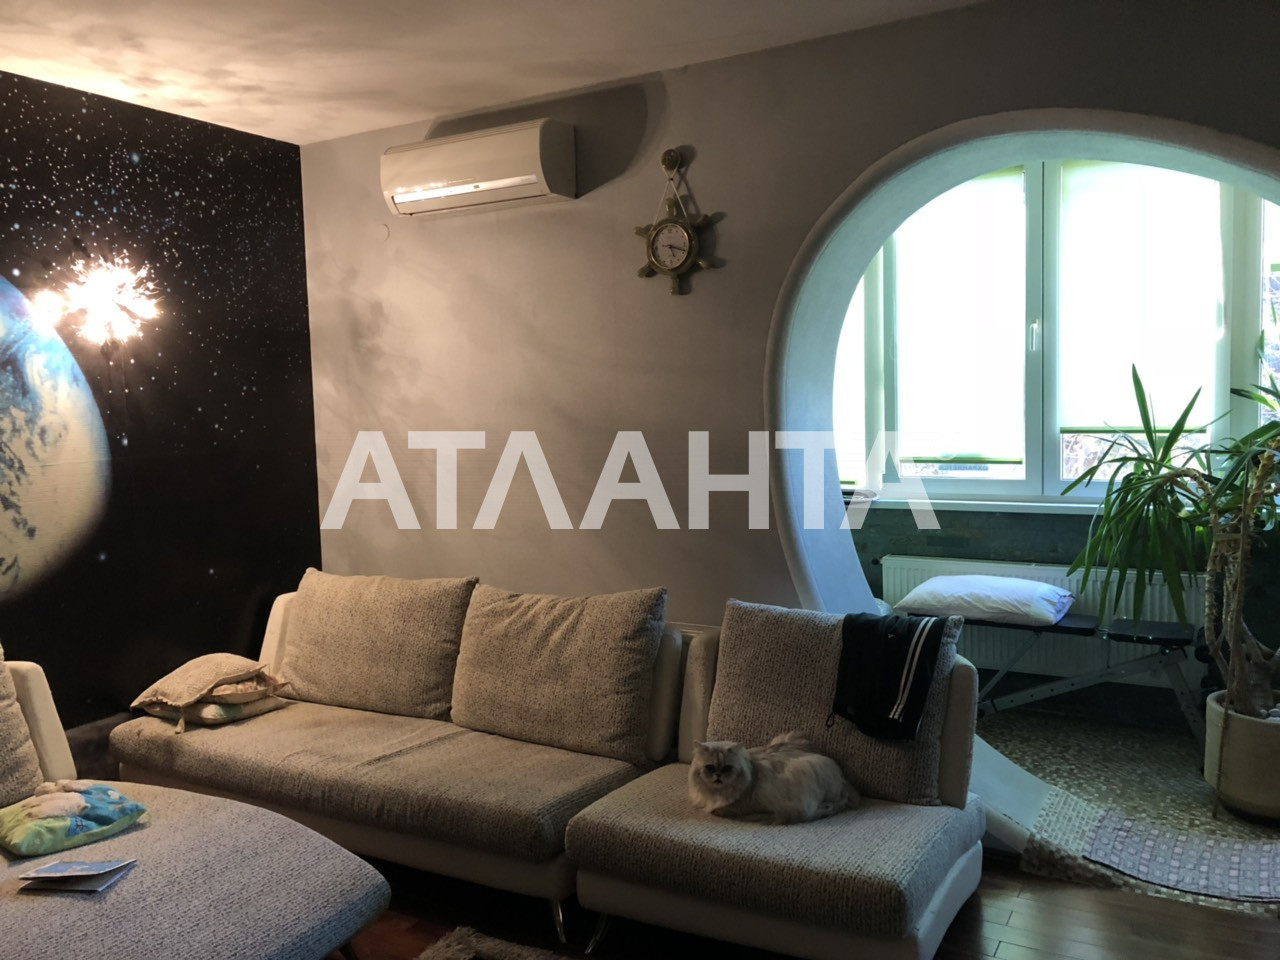 Продается 3-комнатная Квартира на ул. 1 Мая — 135 000 у.е. (фото №6)